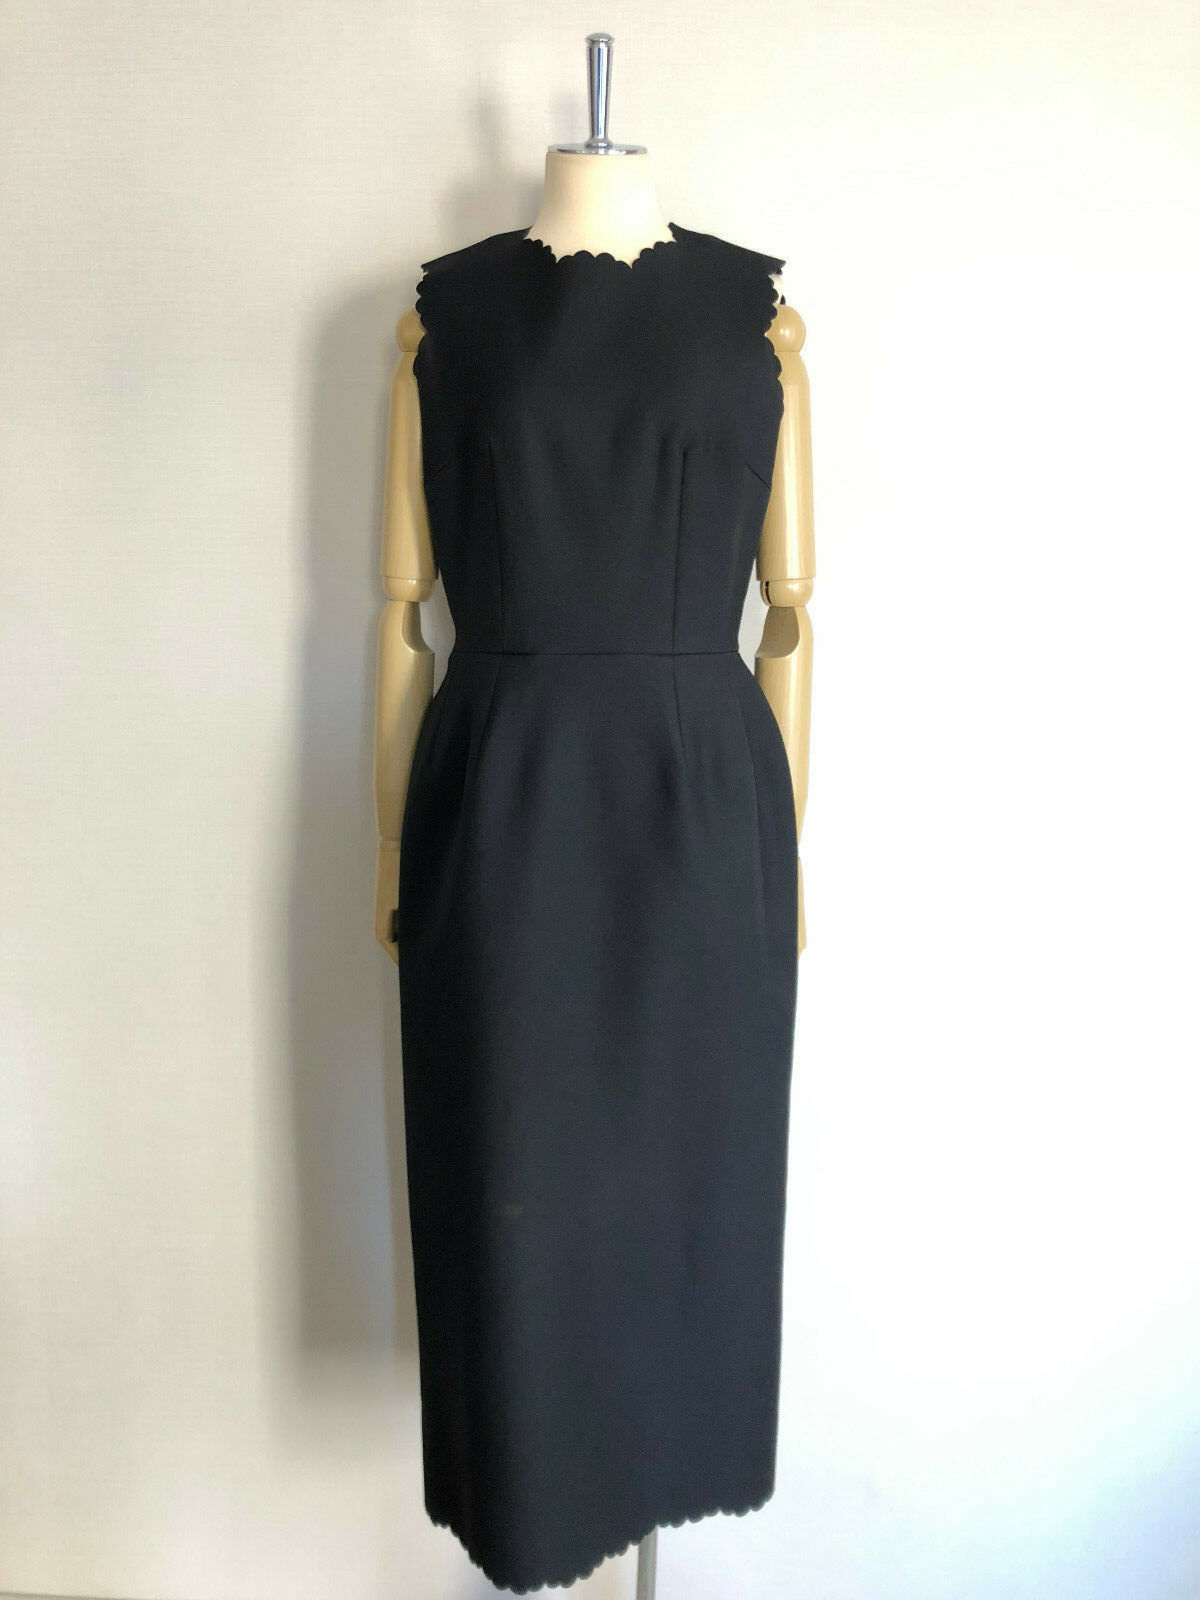 AD1998 Vintage Comme Des Garcons dress - image 2